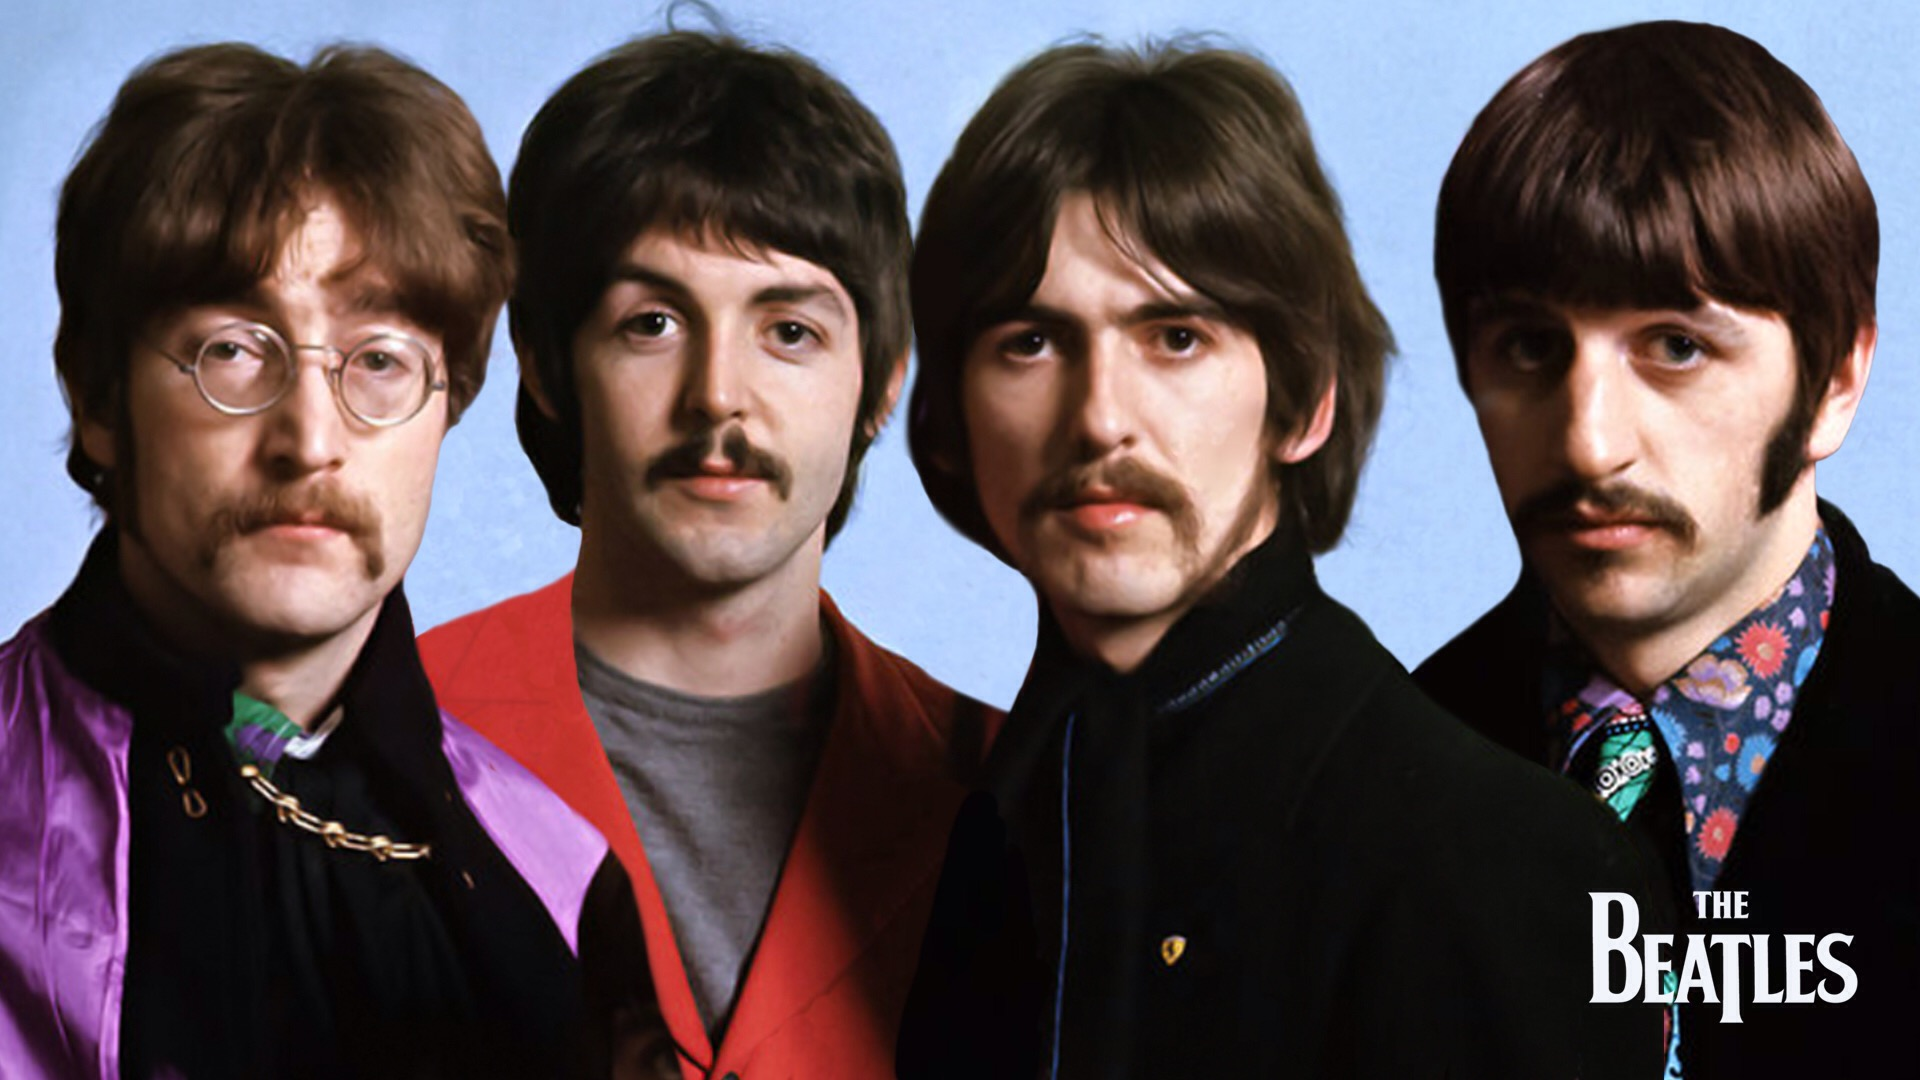 У группы The Beatles вышел новый клип